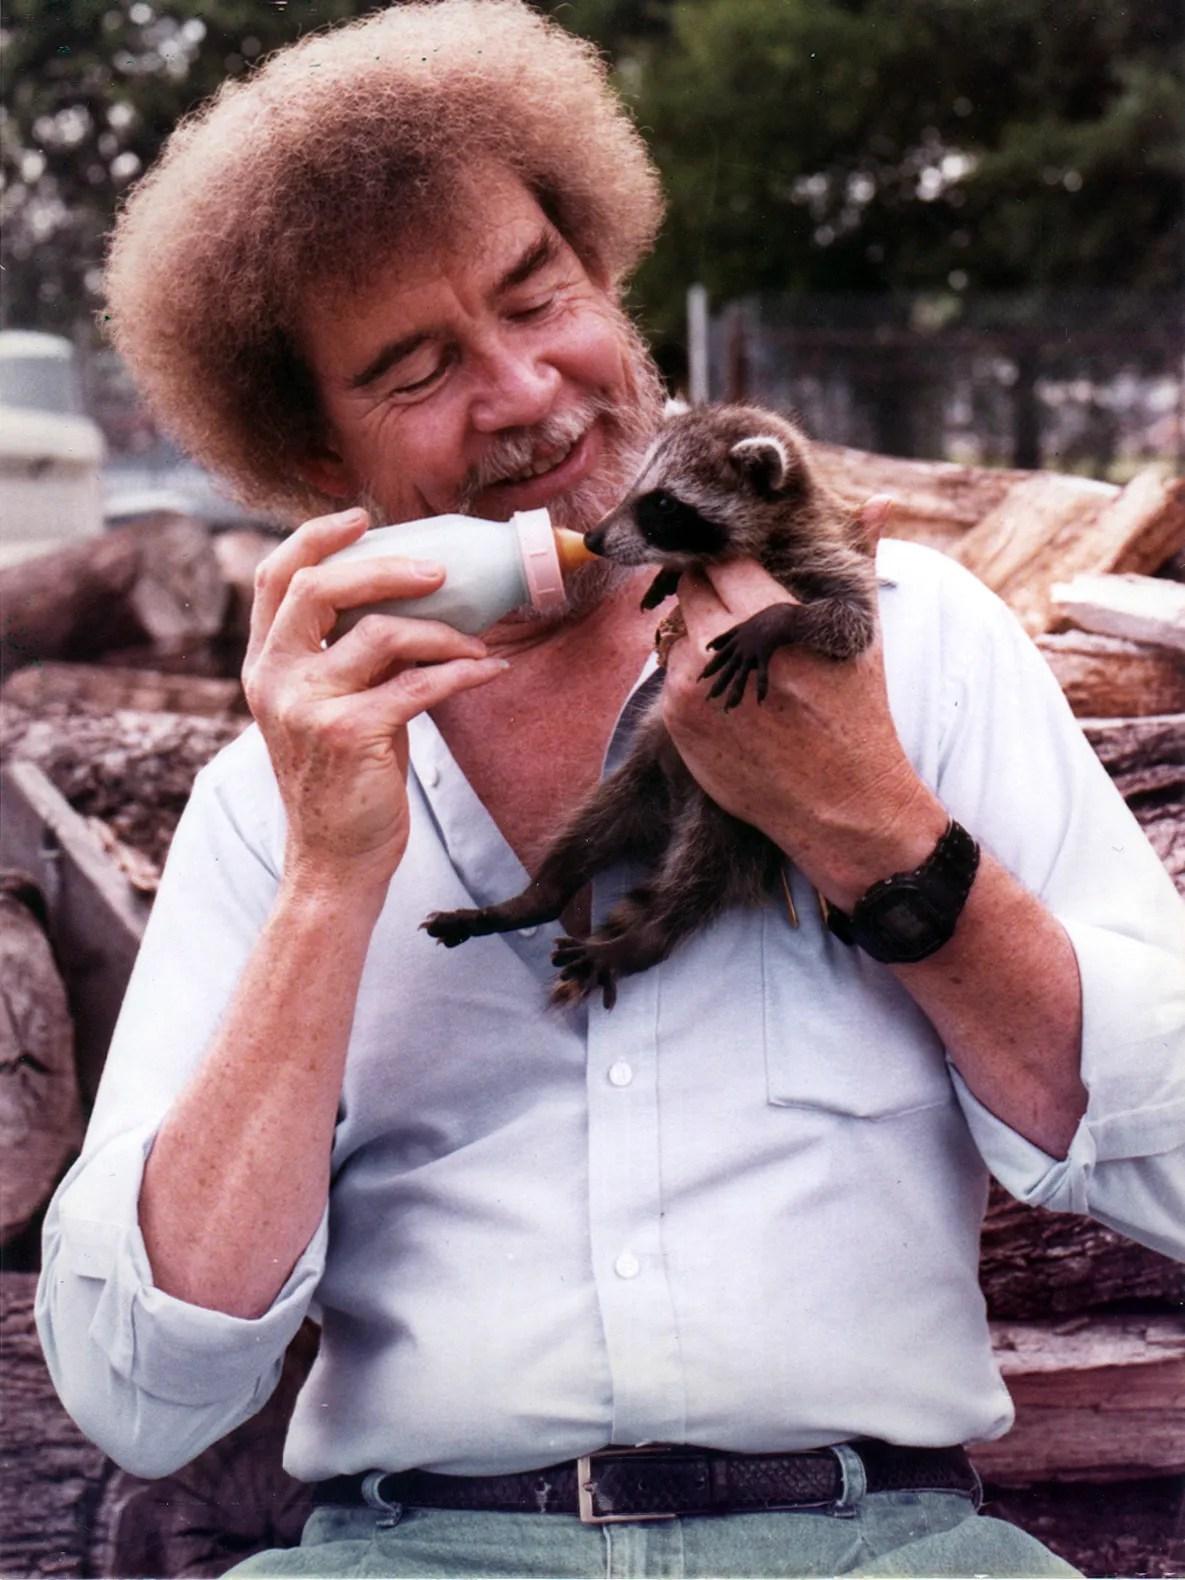 bob ross looking fly and feeding a baby raccoon